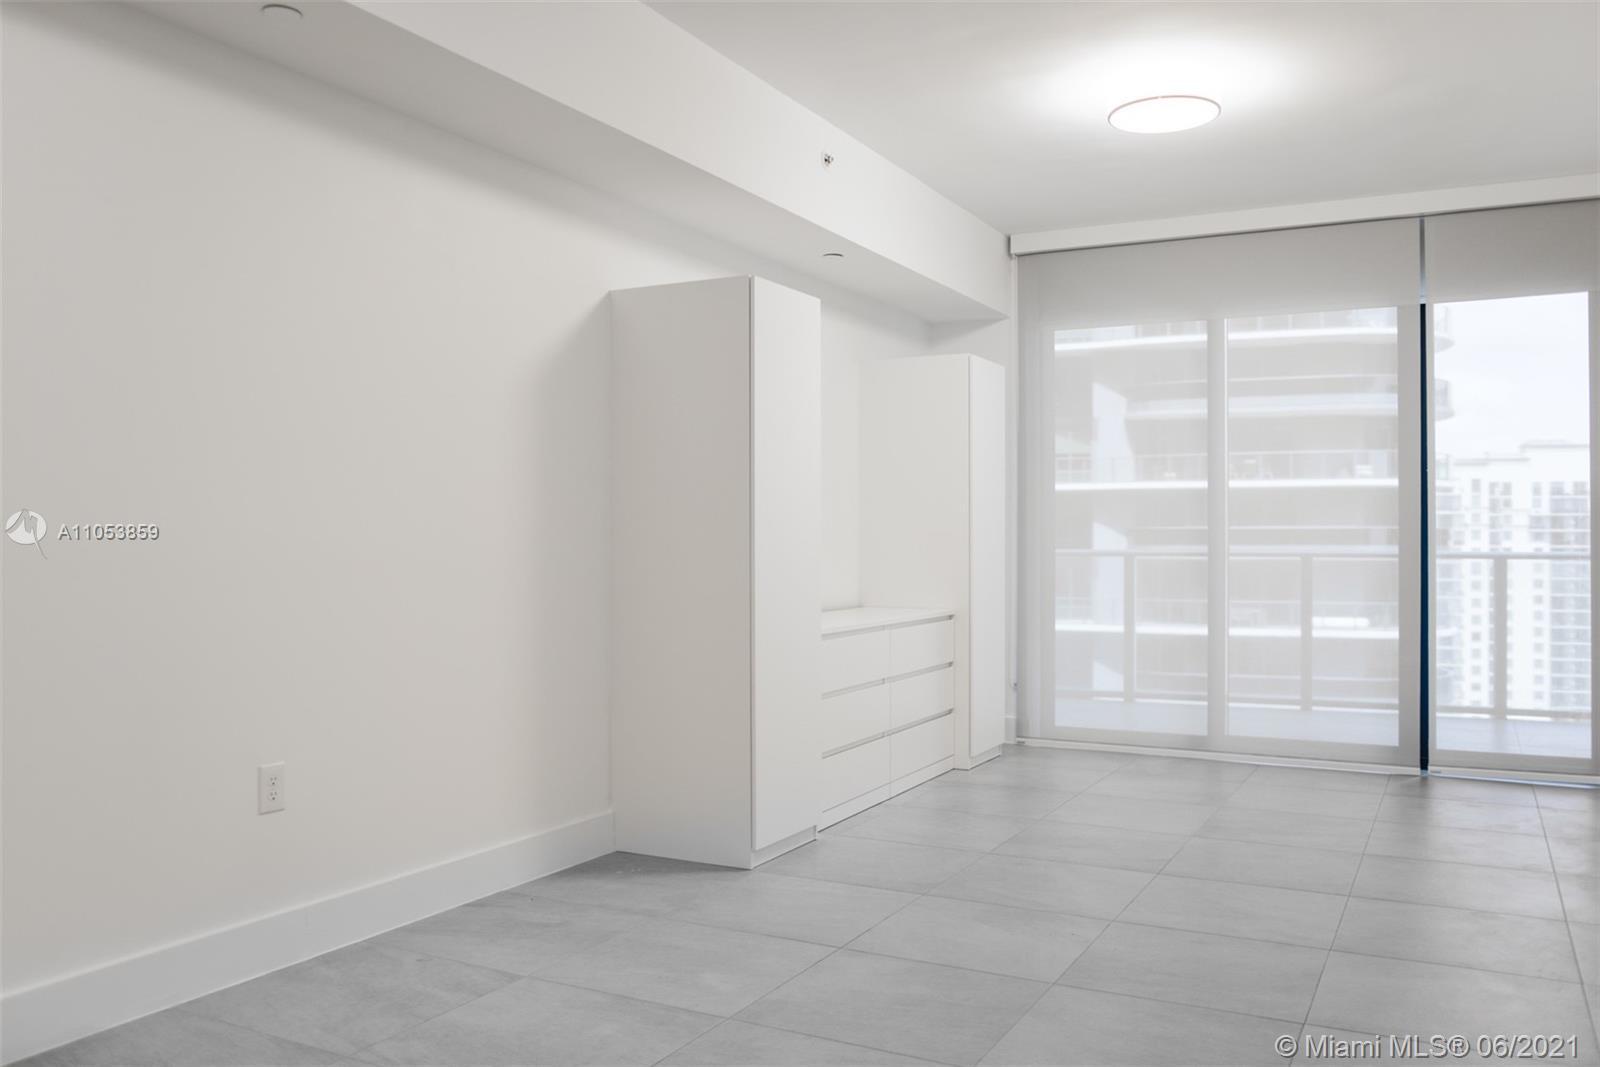 1010 Brickell #3210 - 03 - photo